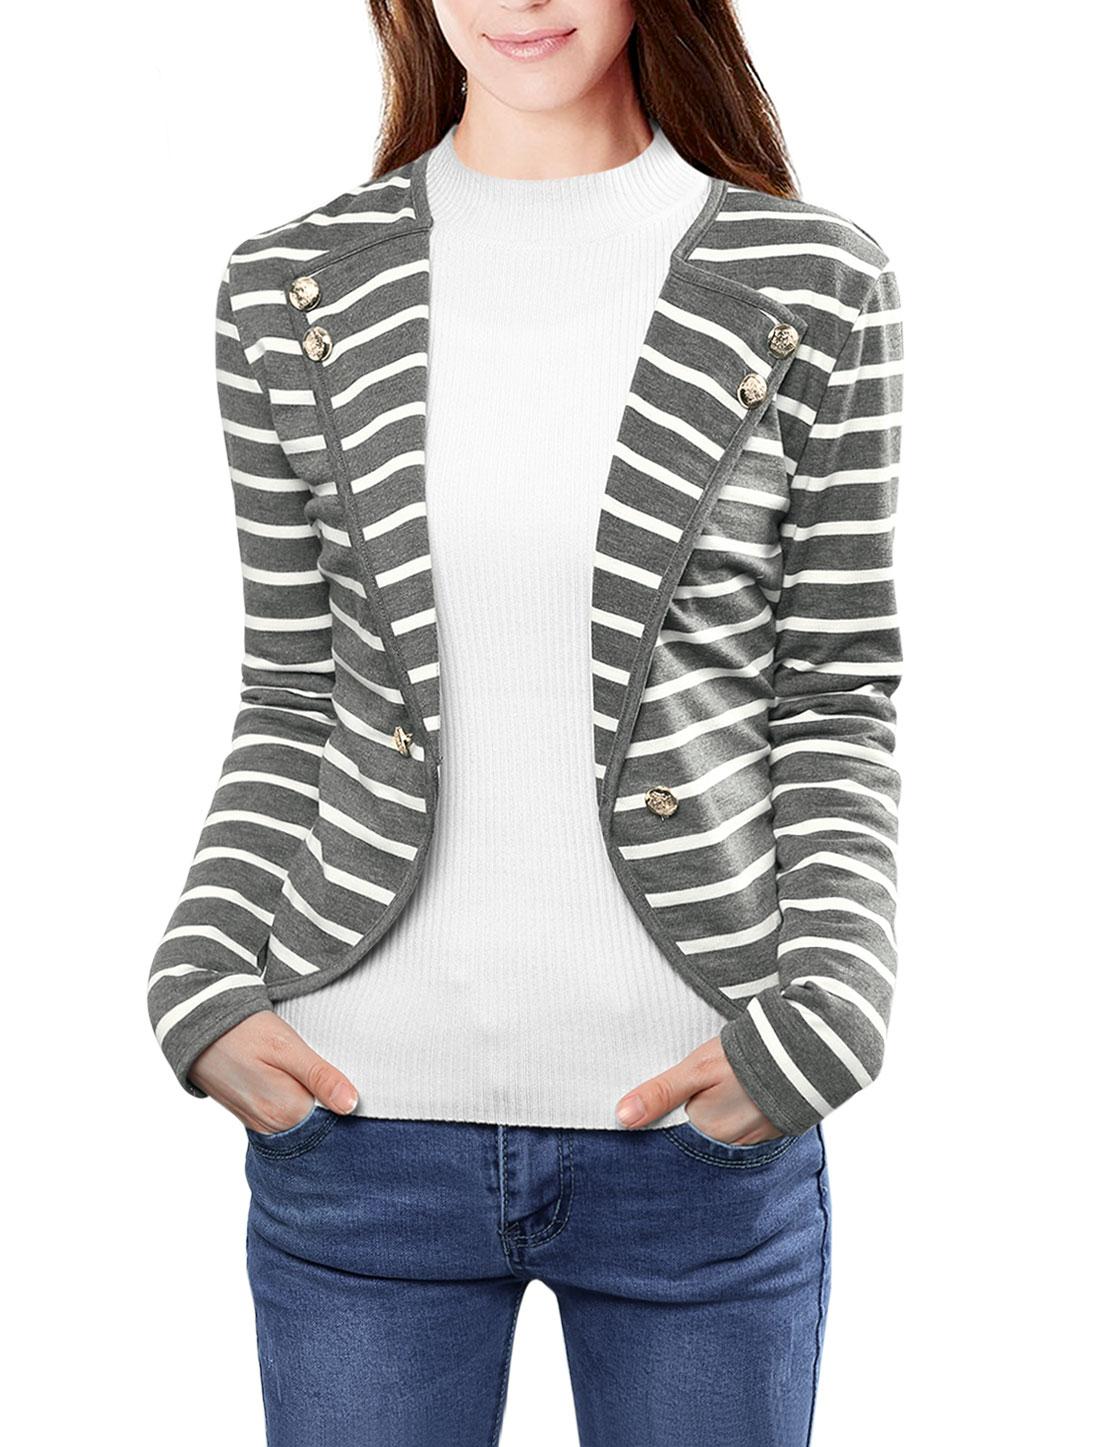 Ladies Notched Lapel Button Decor Striped Blazer Gray White M